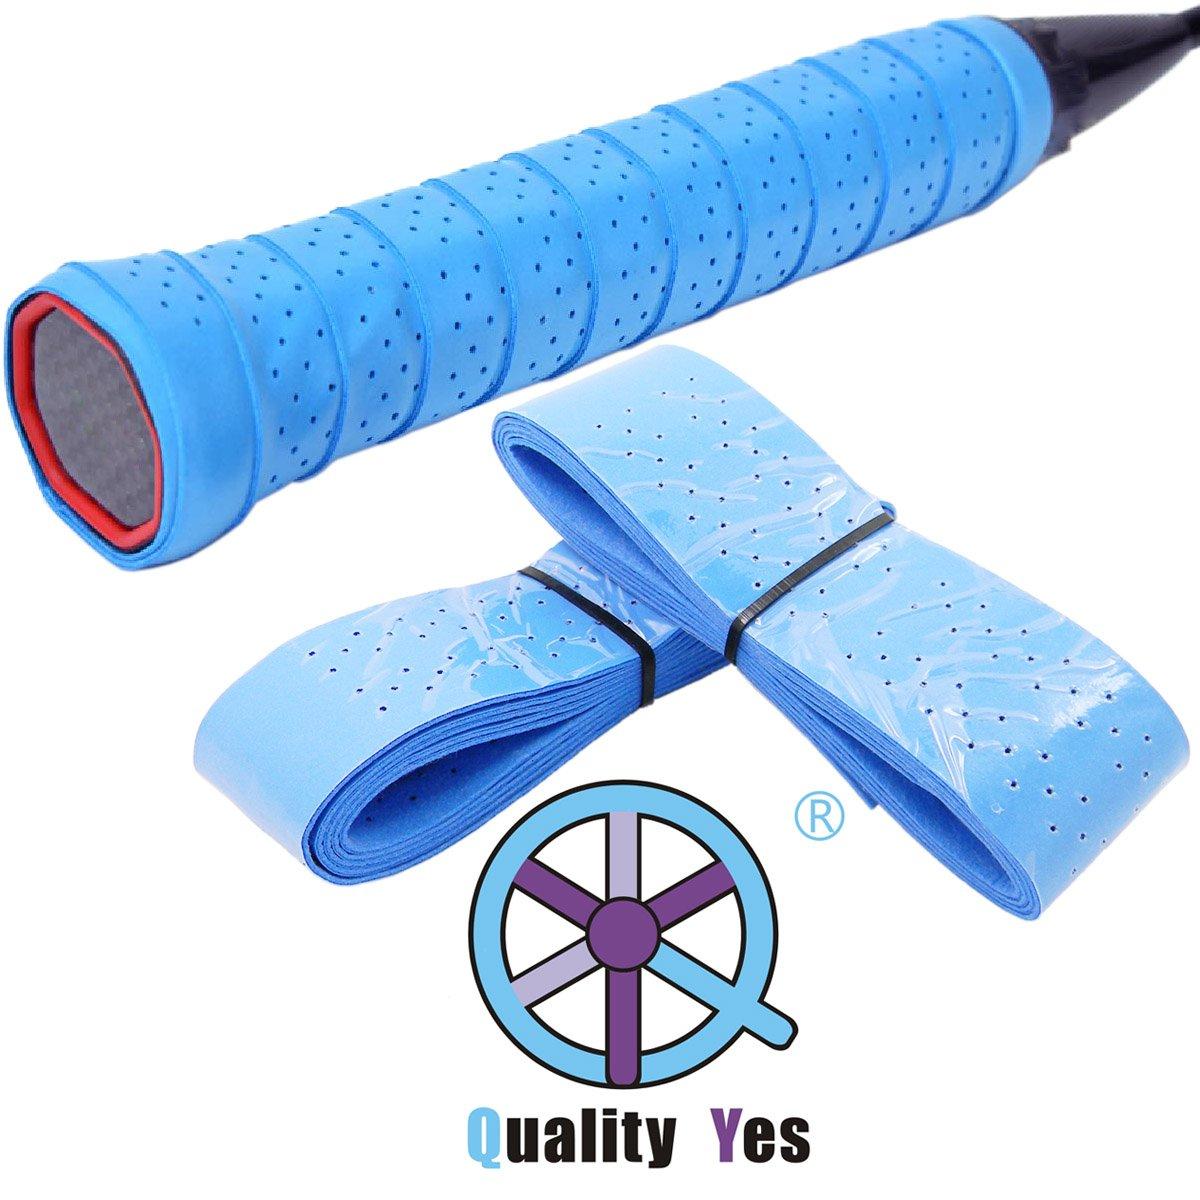 QY 2Pack Widened Perforated Super Absorbent Tennis Racket Overgrip Anti Slip Badminton Racket Tape Wrap Table Tennis Racket Tape, Dark Blue